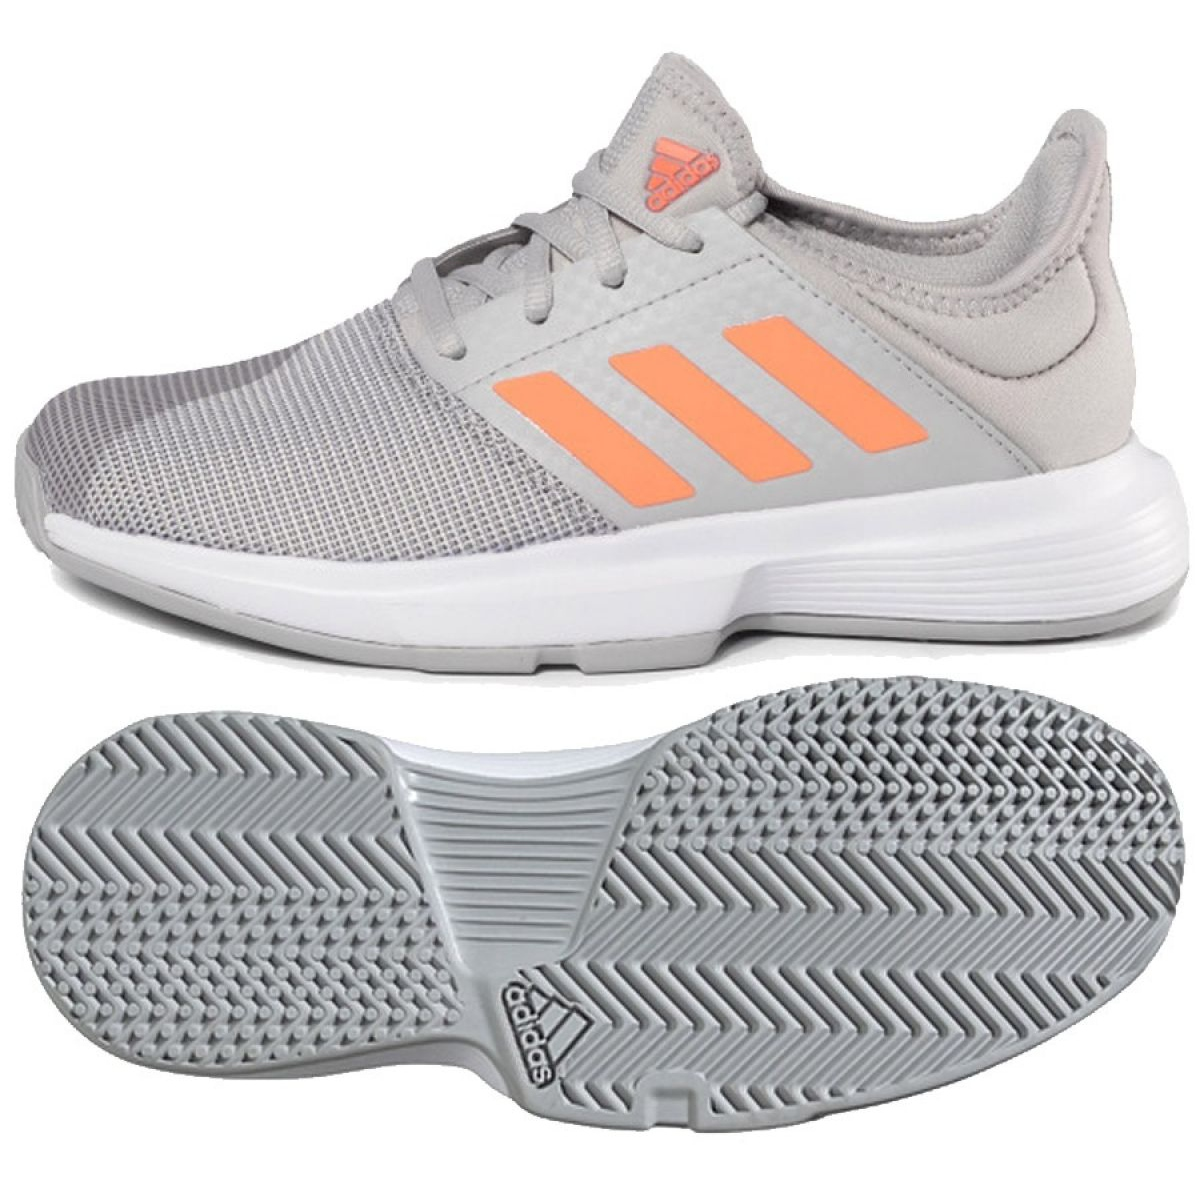 Adidas Game Court W EG2015 cipő szürke